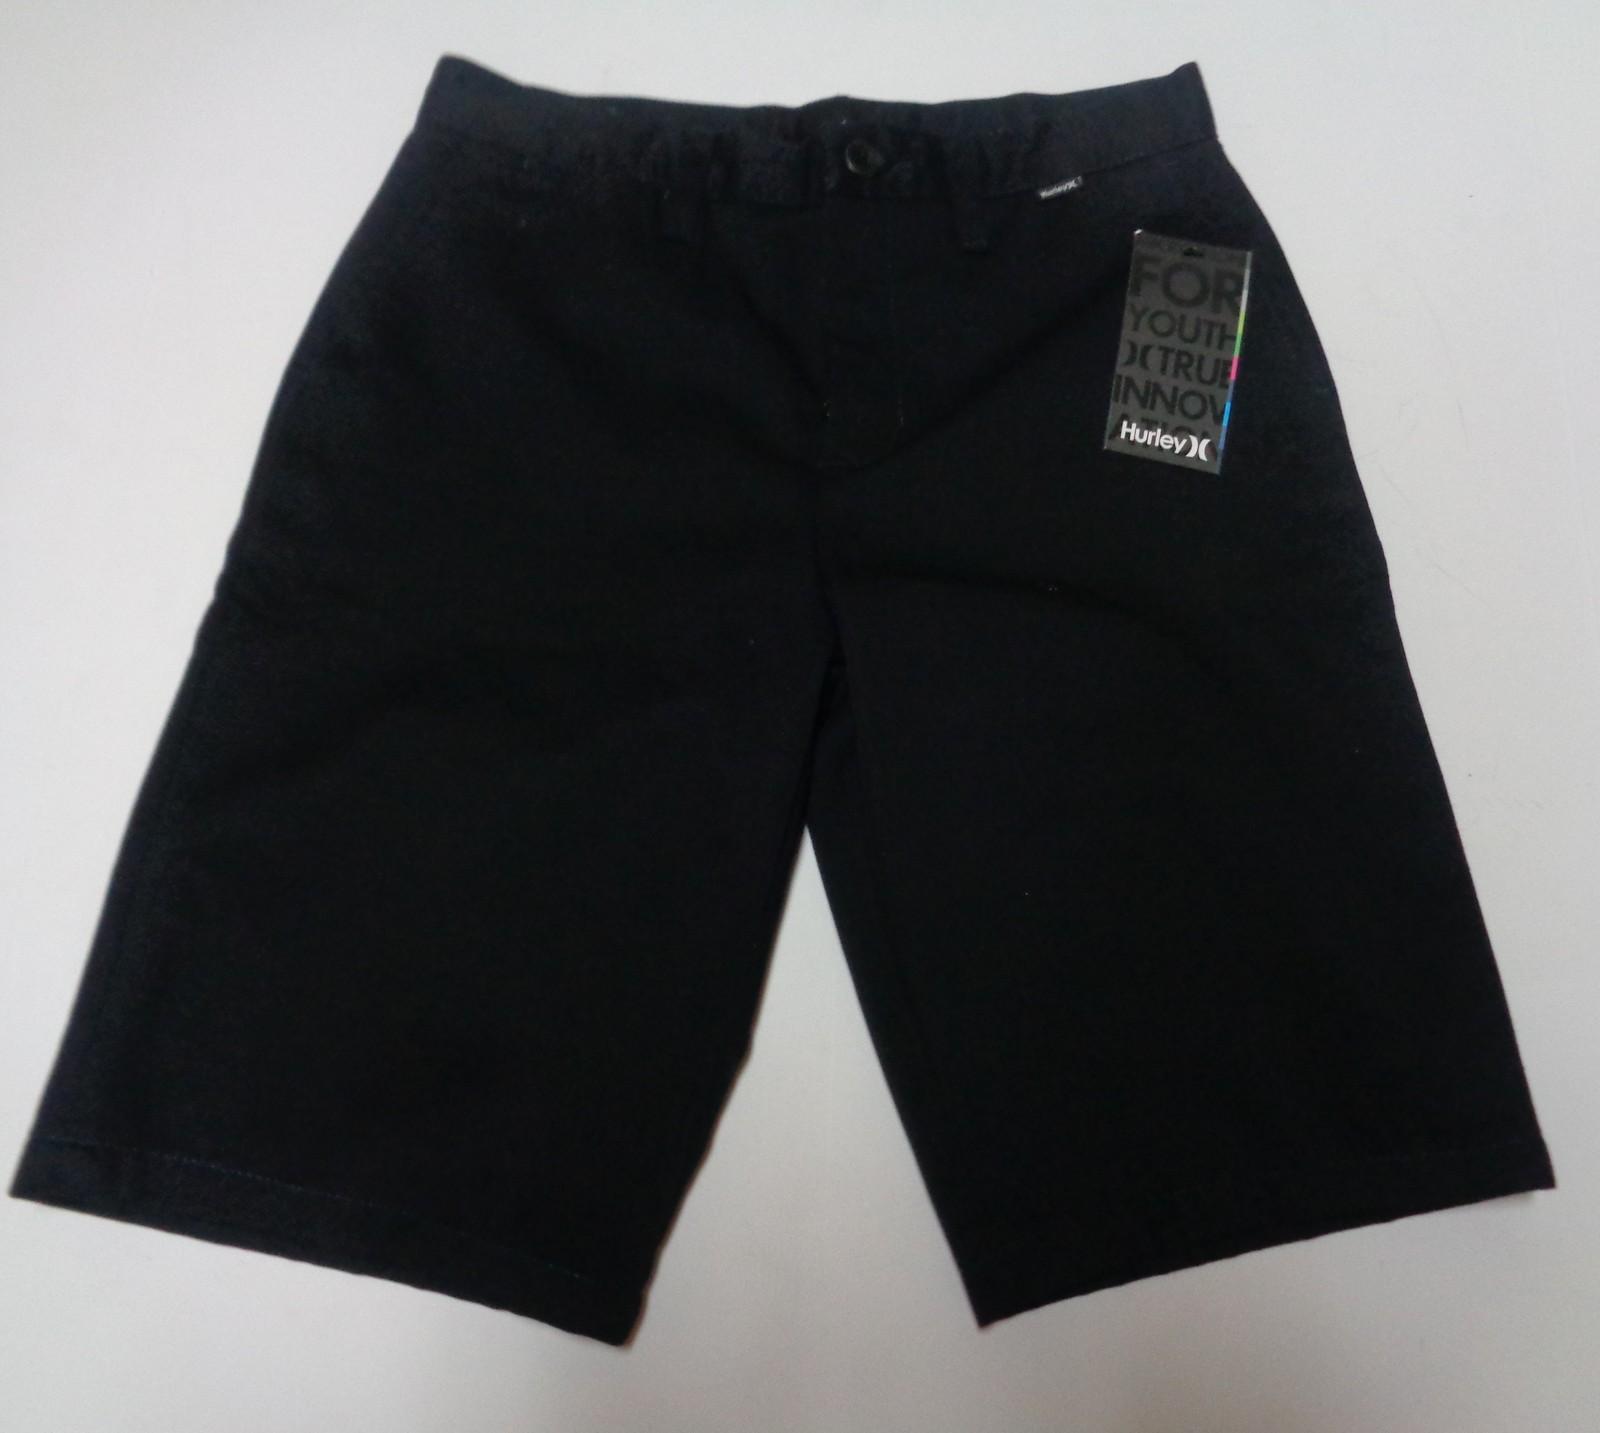 Hurley One & Only Chino Walk Shorts Black NWT Sz 27